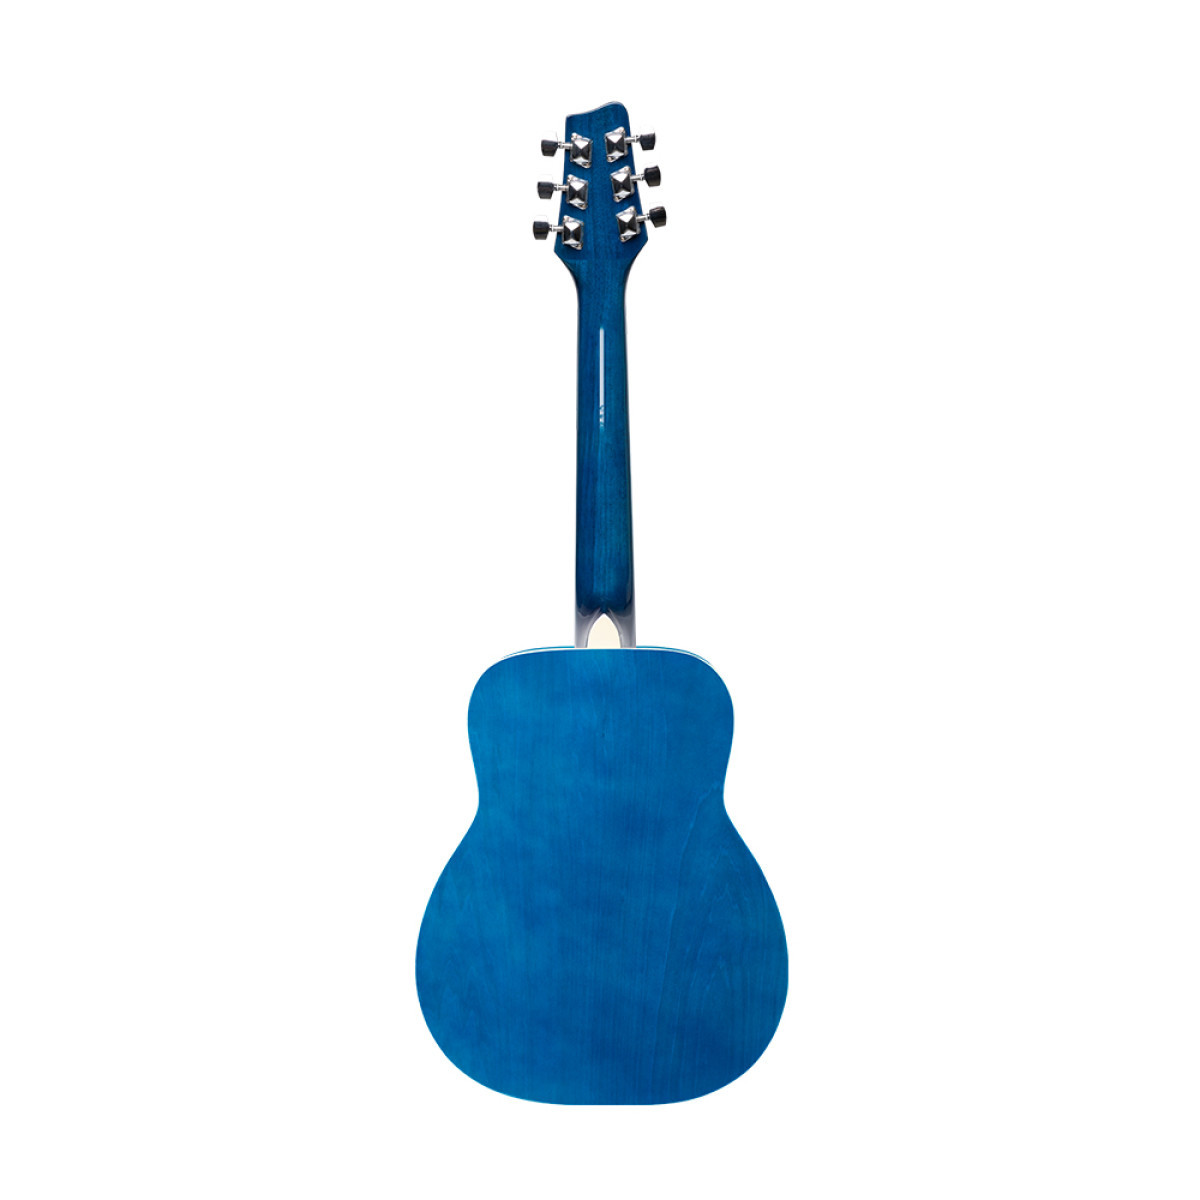 Guitare enfant 1/2 folk bleu